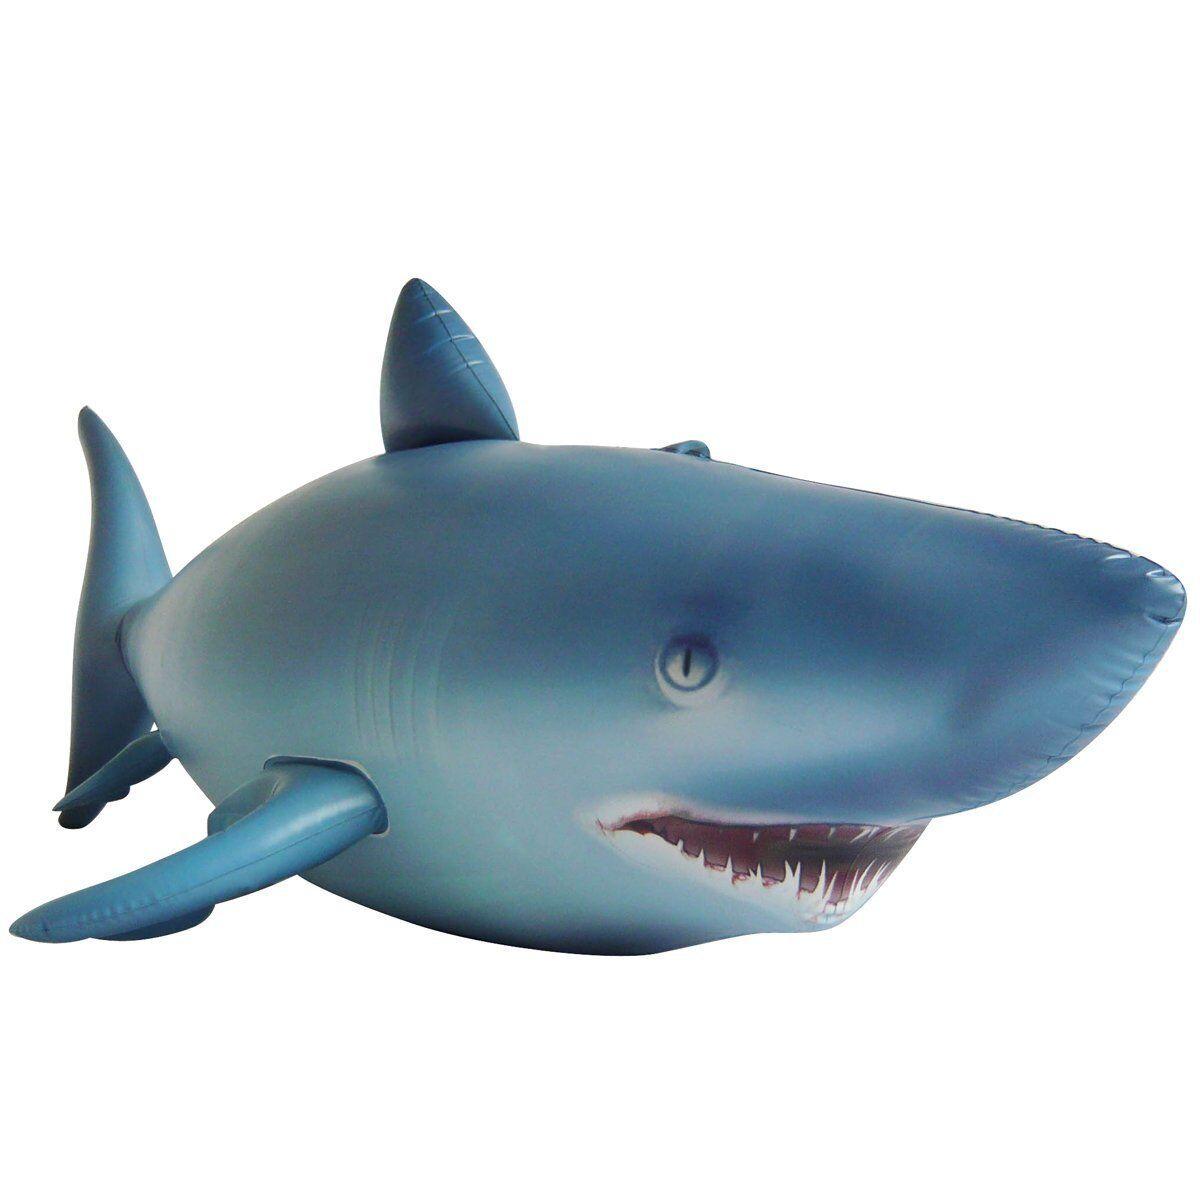 Inflatable Giant Shark - 7ft long and very lifelike